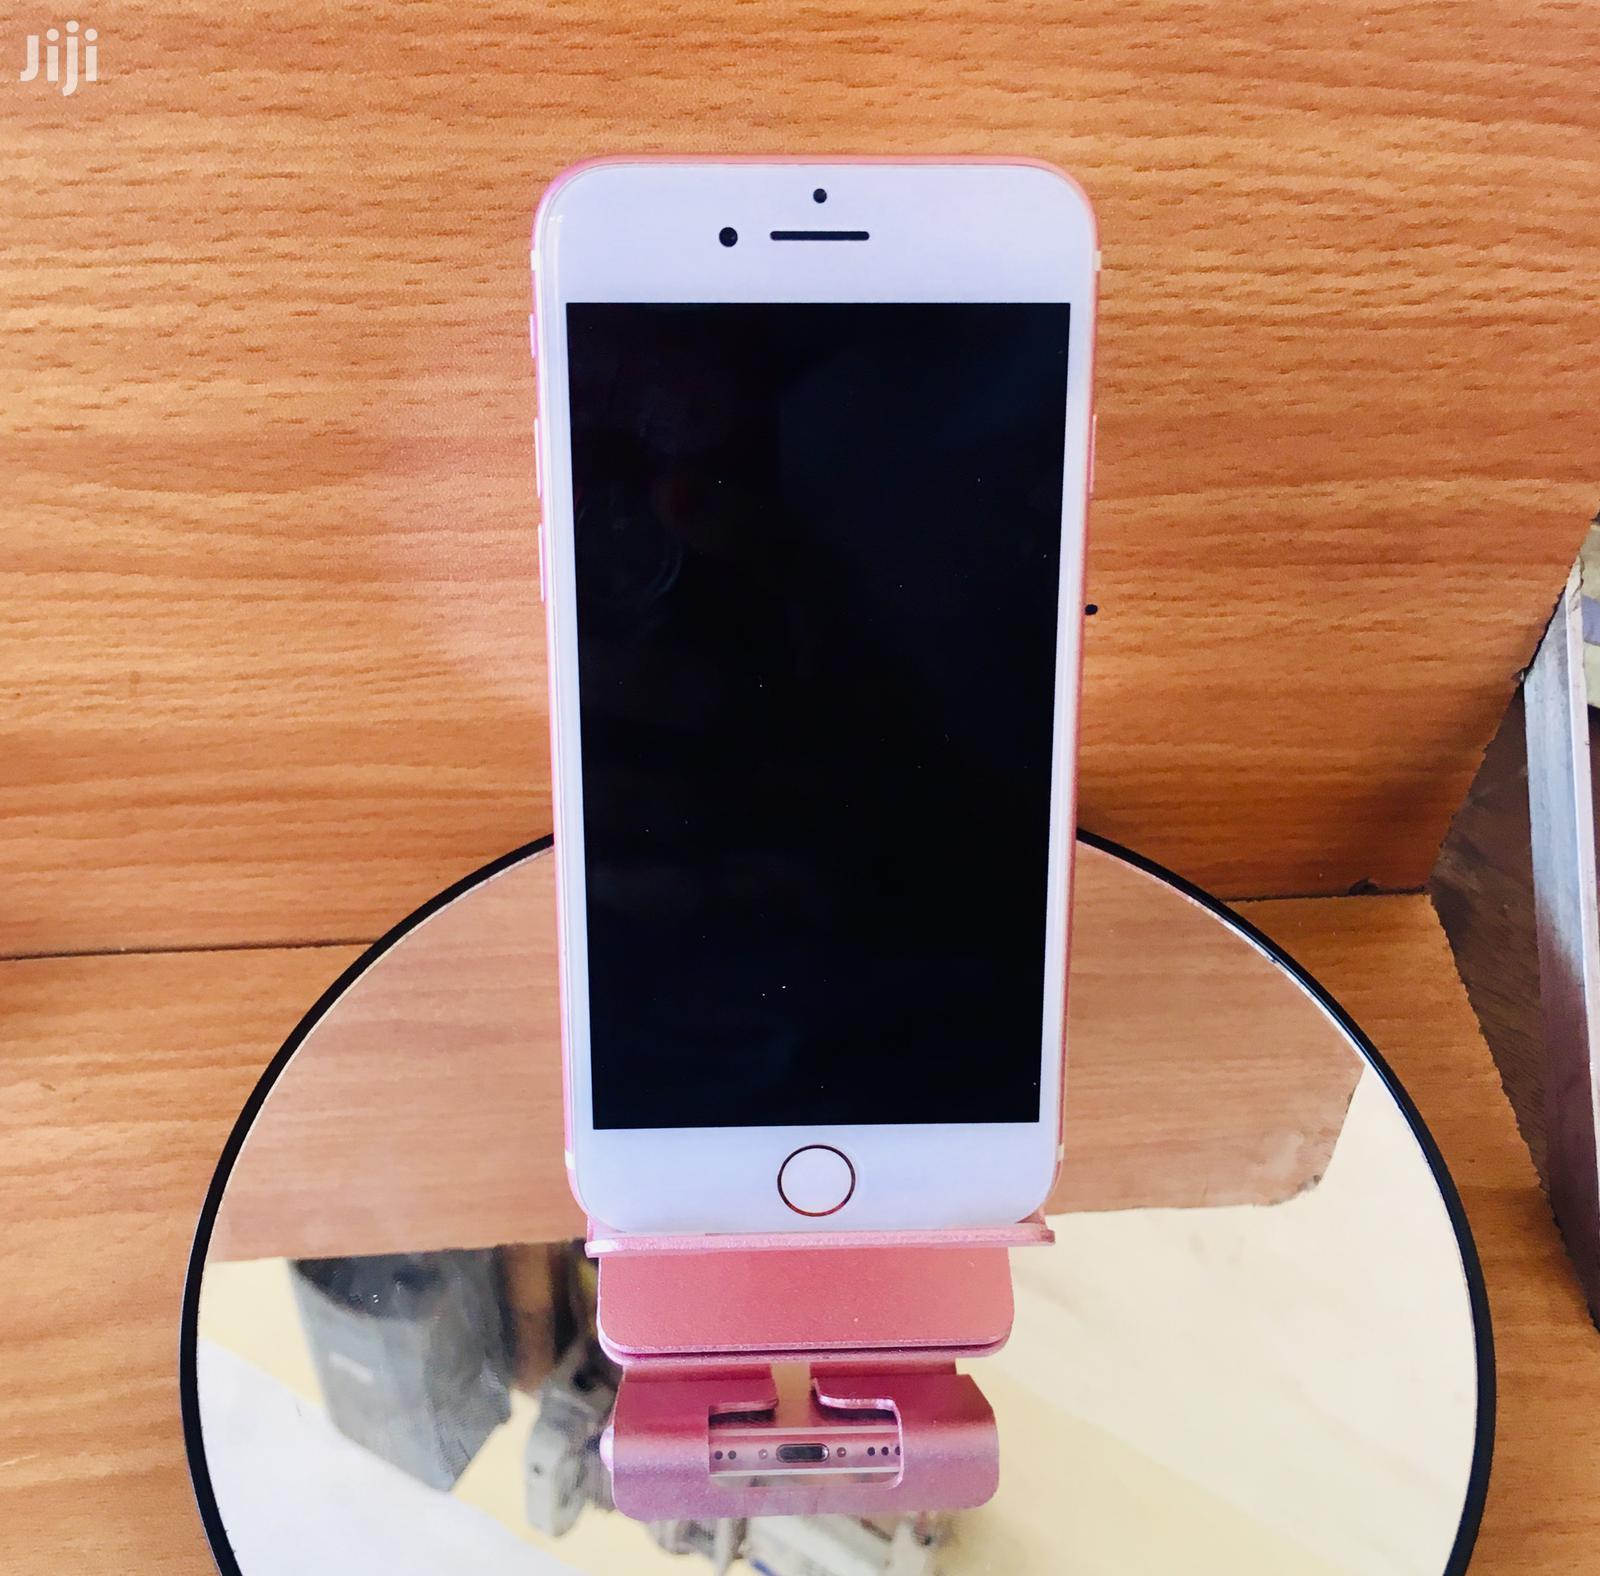 Apple iPhone 7 128 GB | Mobile Phones for sale in Benin City, Edo State, Nigeria